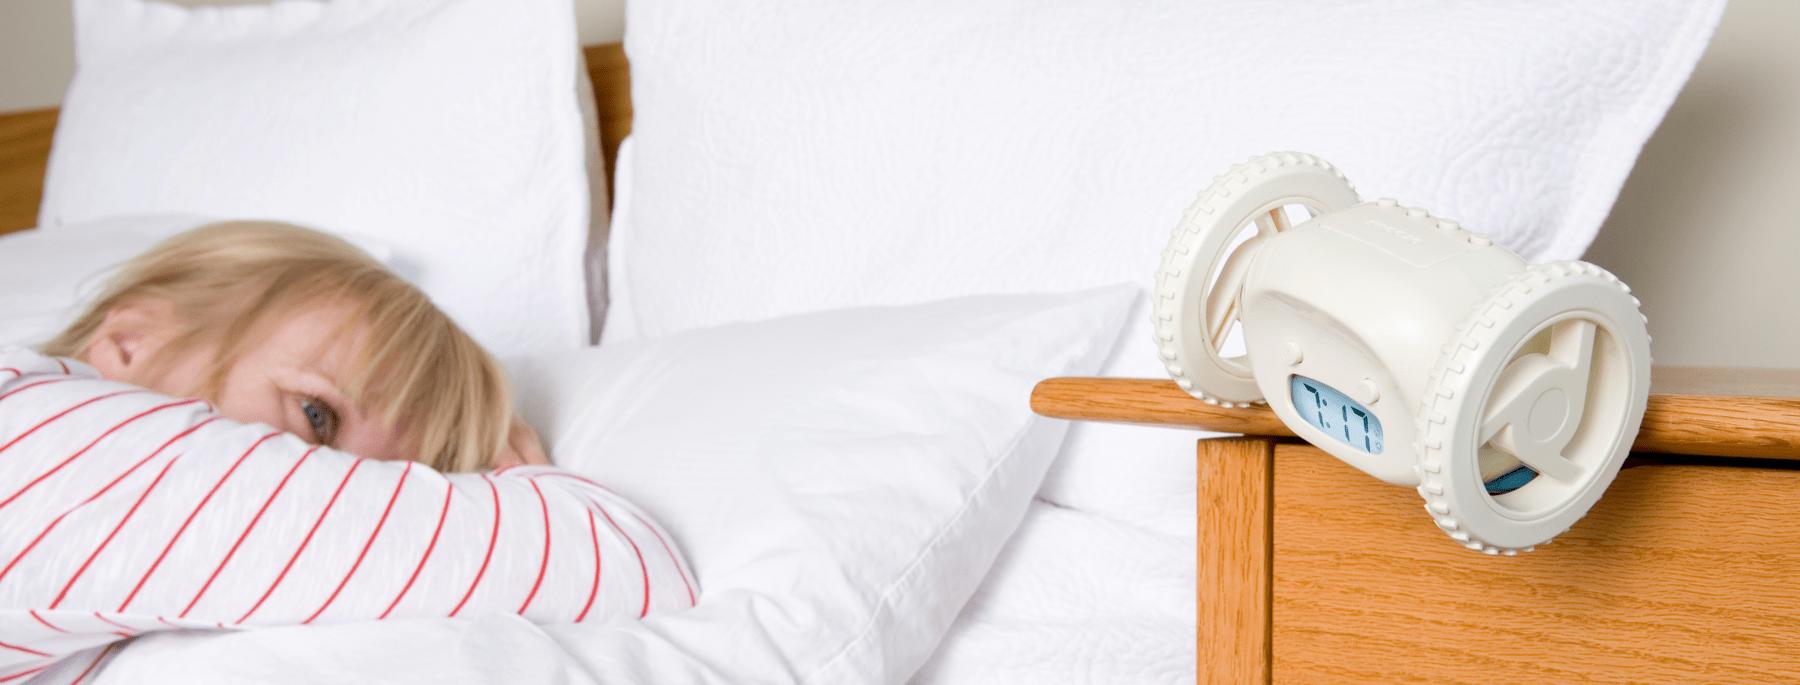 the clocky alarm clock on wheels